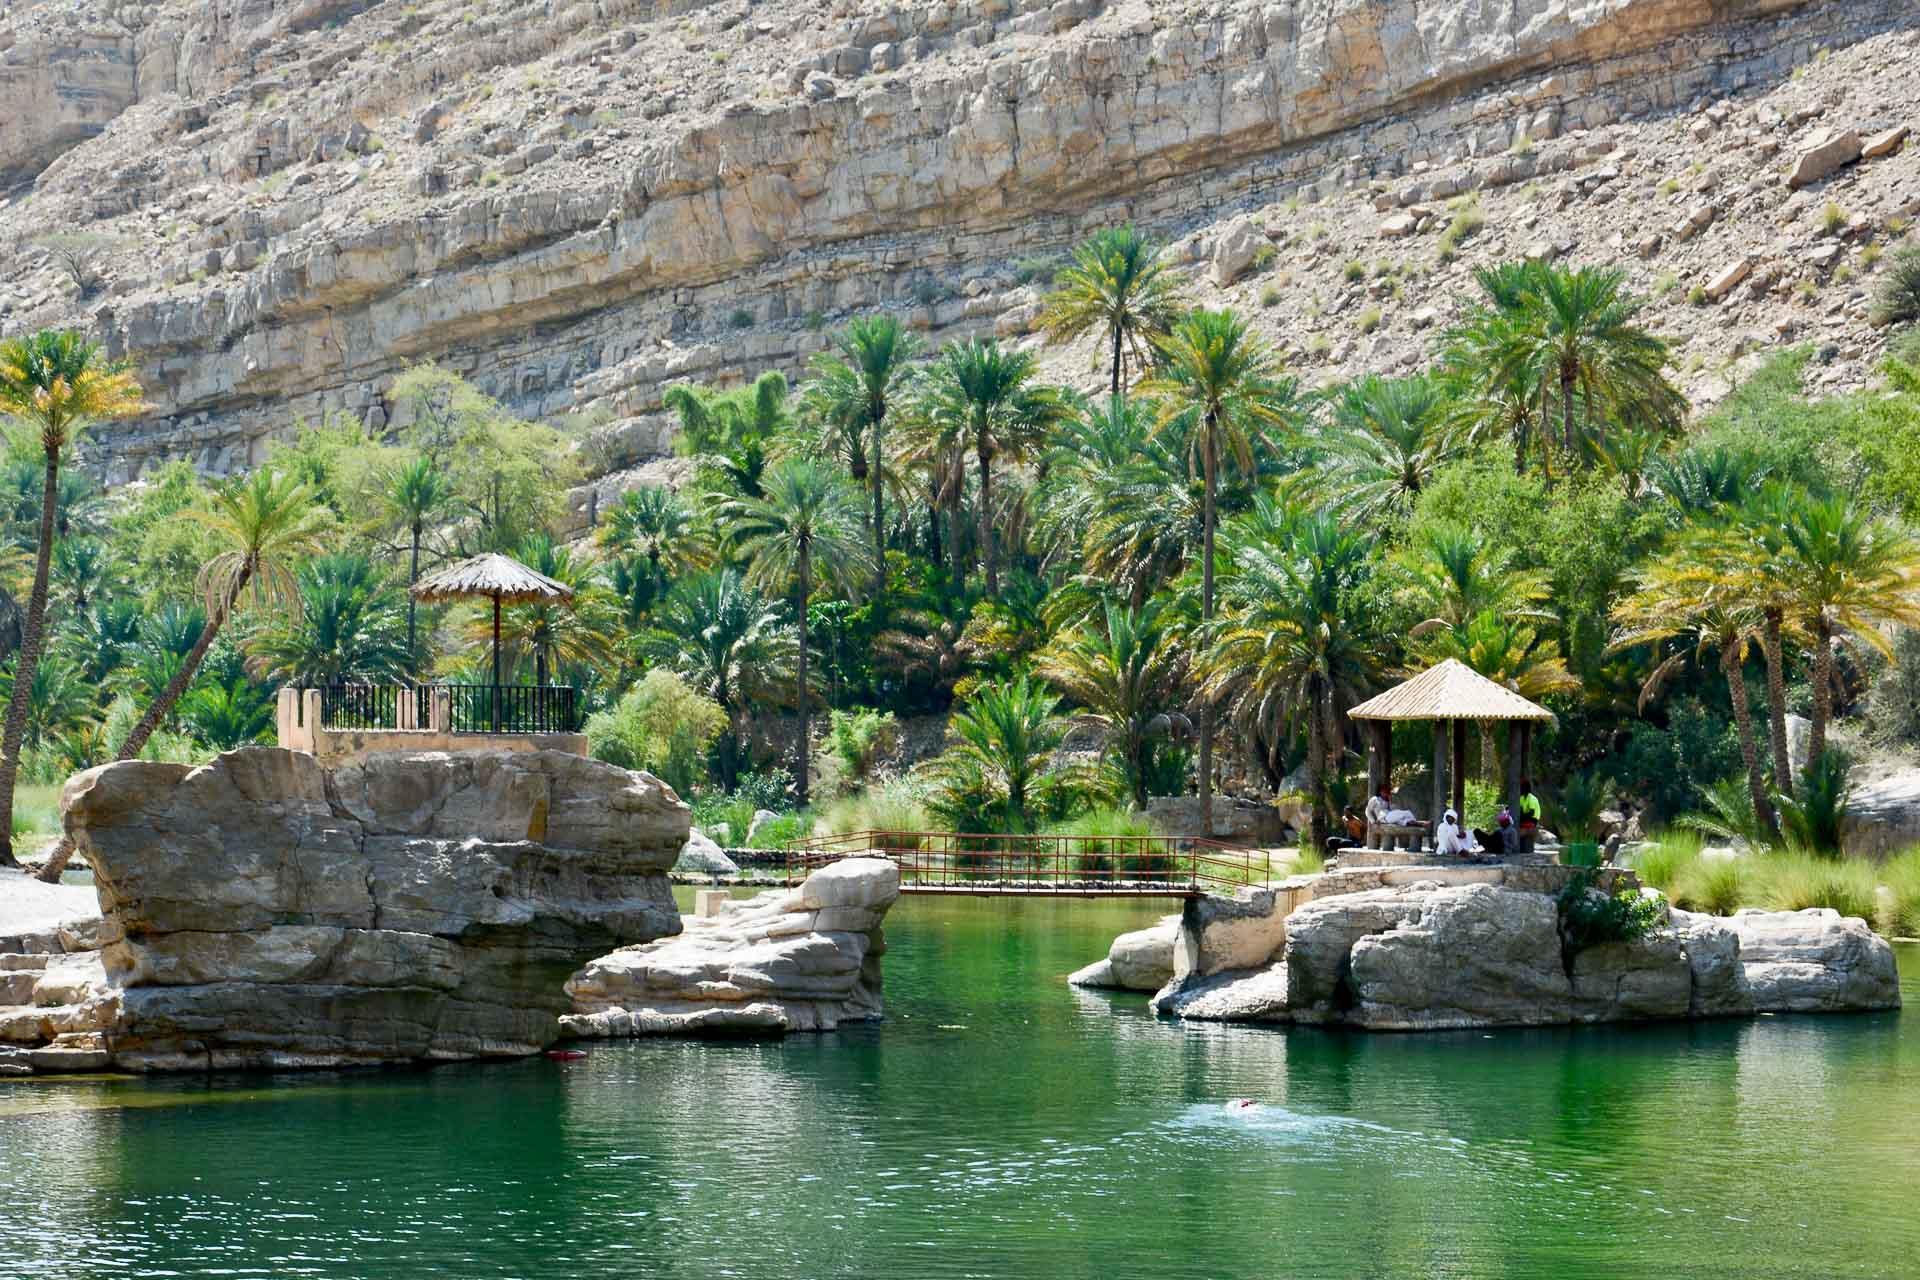 Un des agréables lacs dédiés à la baignade du Wadi Bani Khalid. © Emmanuel Laveran.